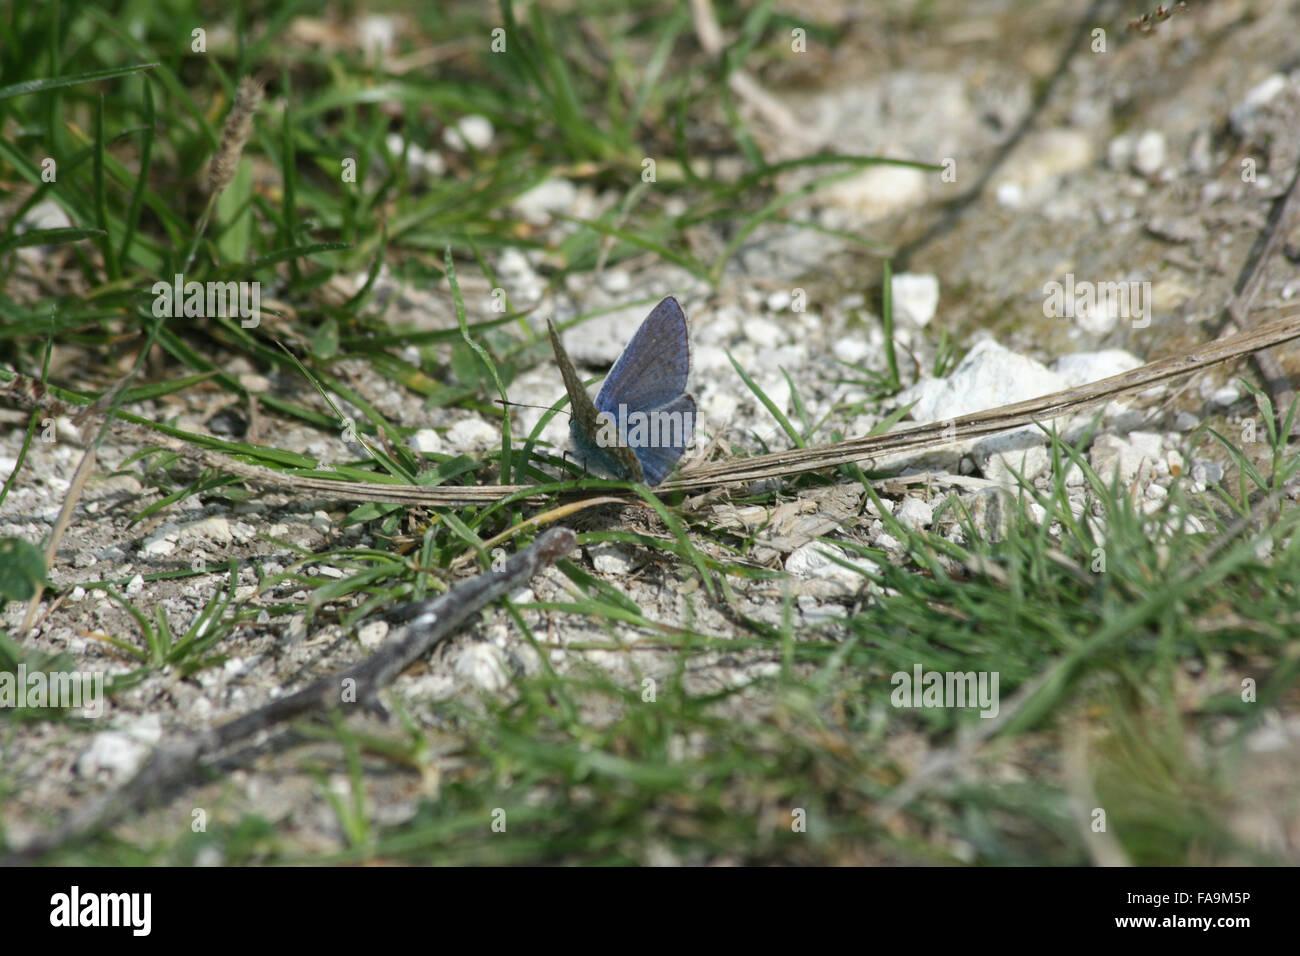 Male chalkhill blue butterfly (Polyommatus coridon) on the ground, on chalk grassland - Stock Image